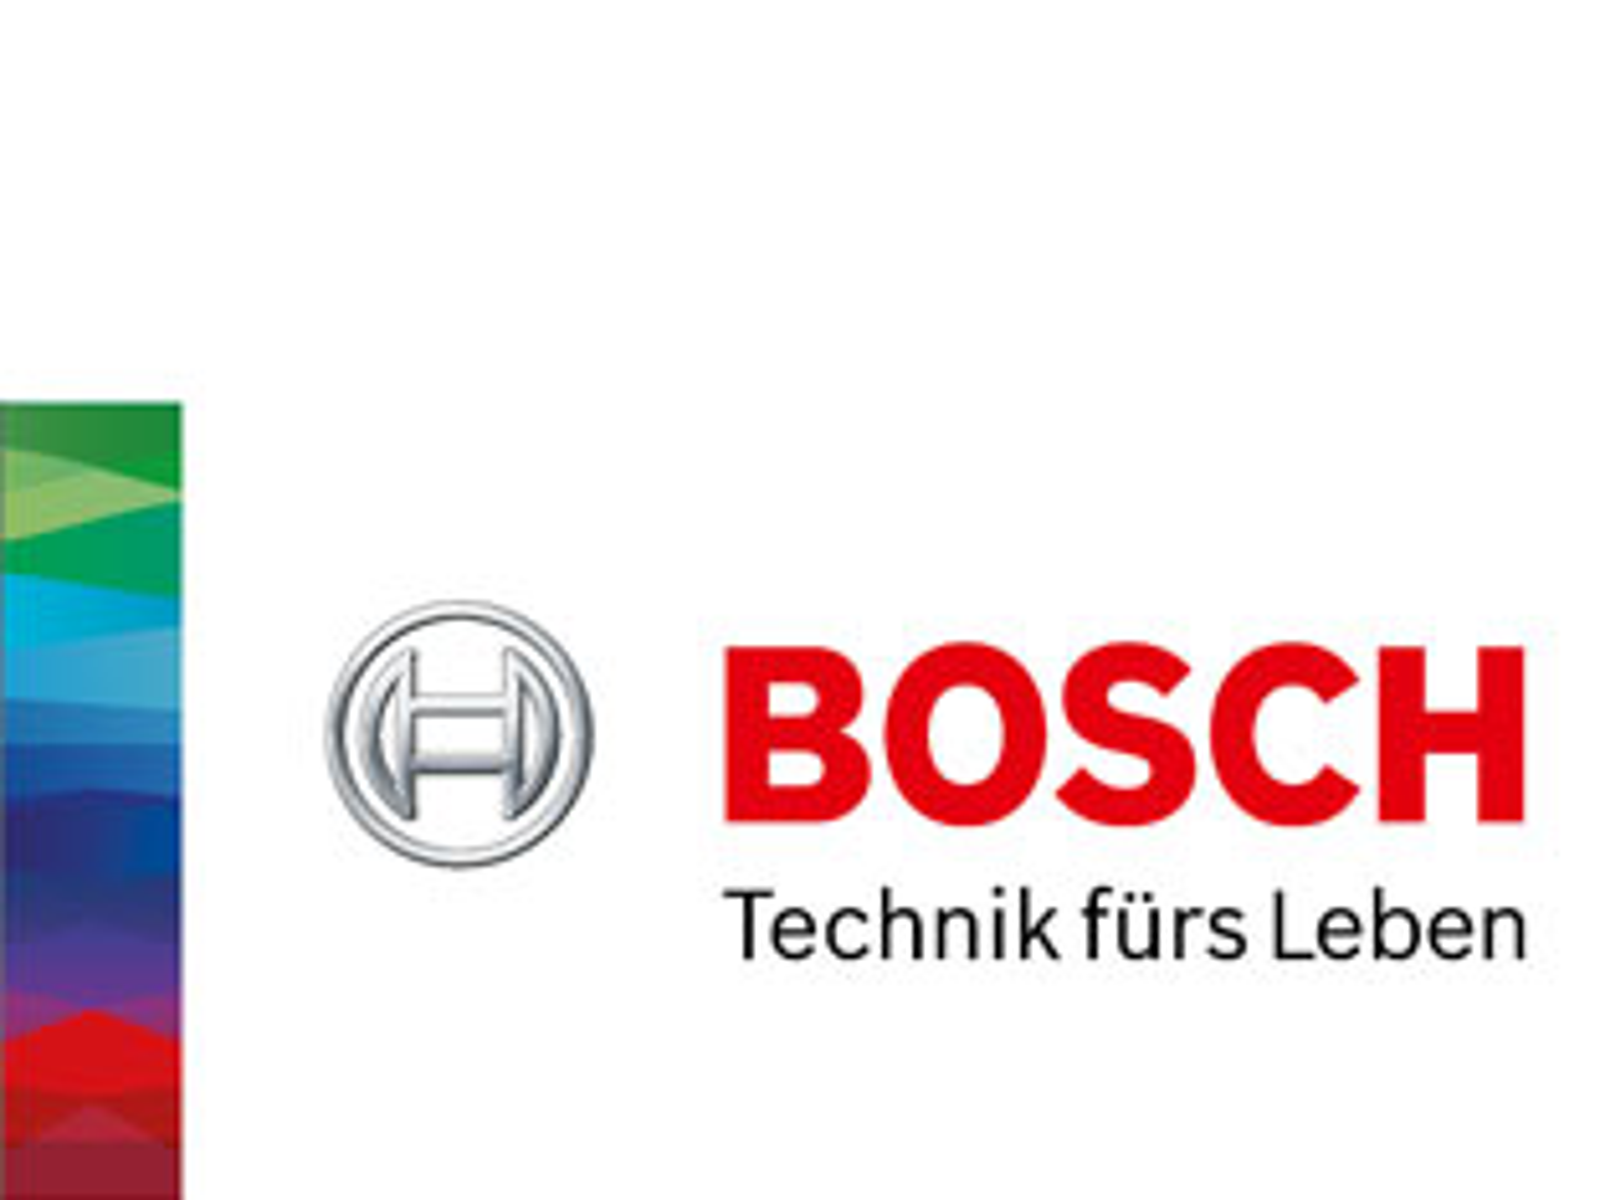 Bosch Firmenprofil